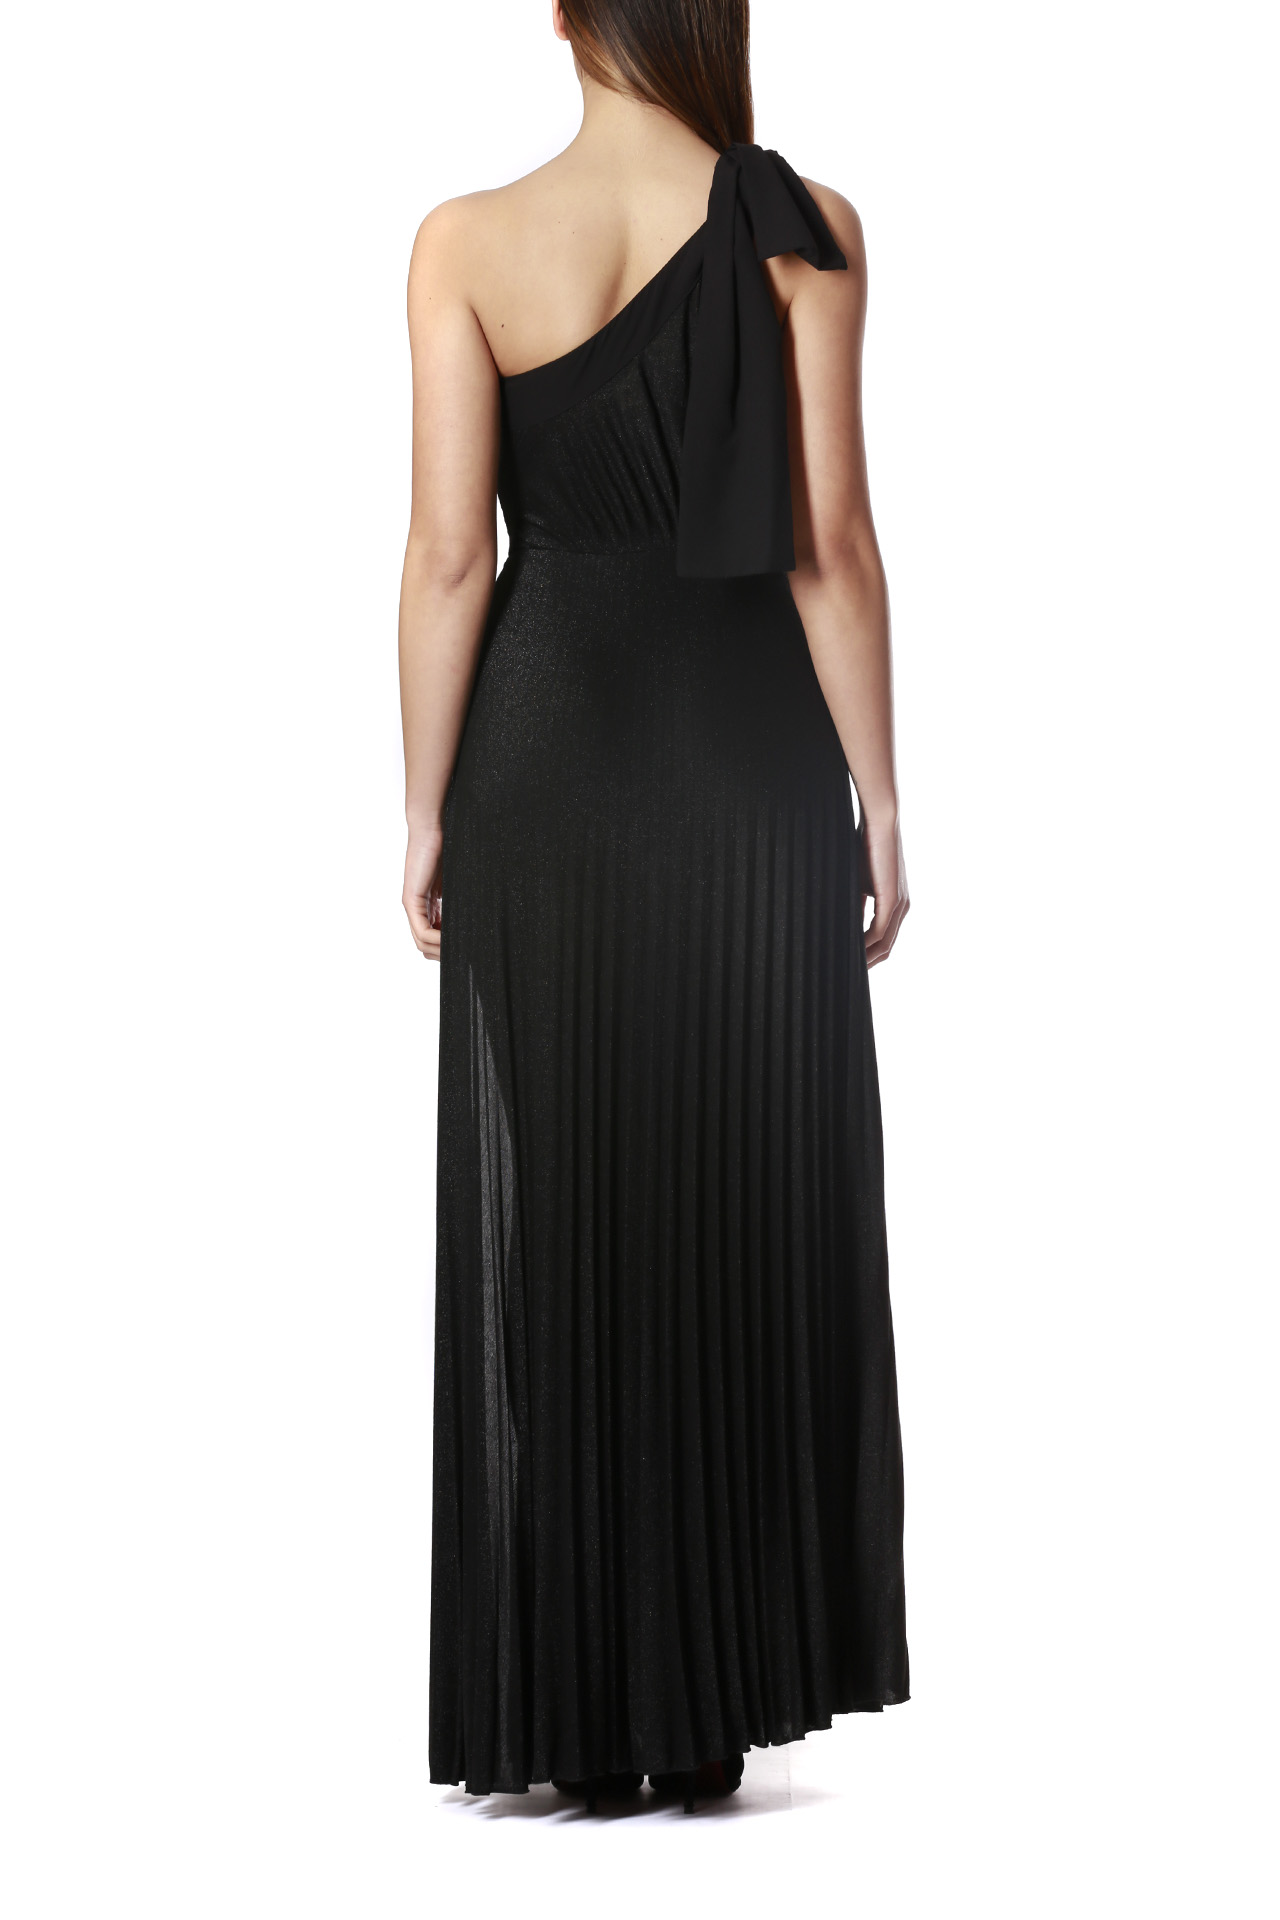 ELISABETTA FRANCHI | Dress | AB15801E2110